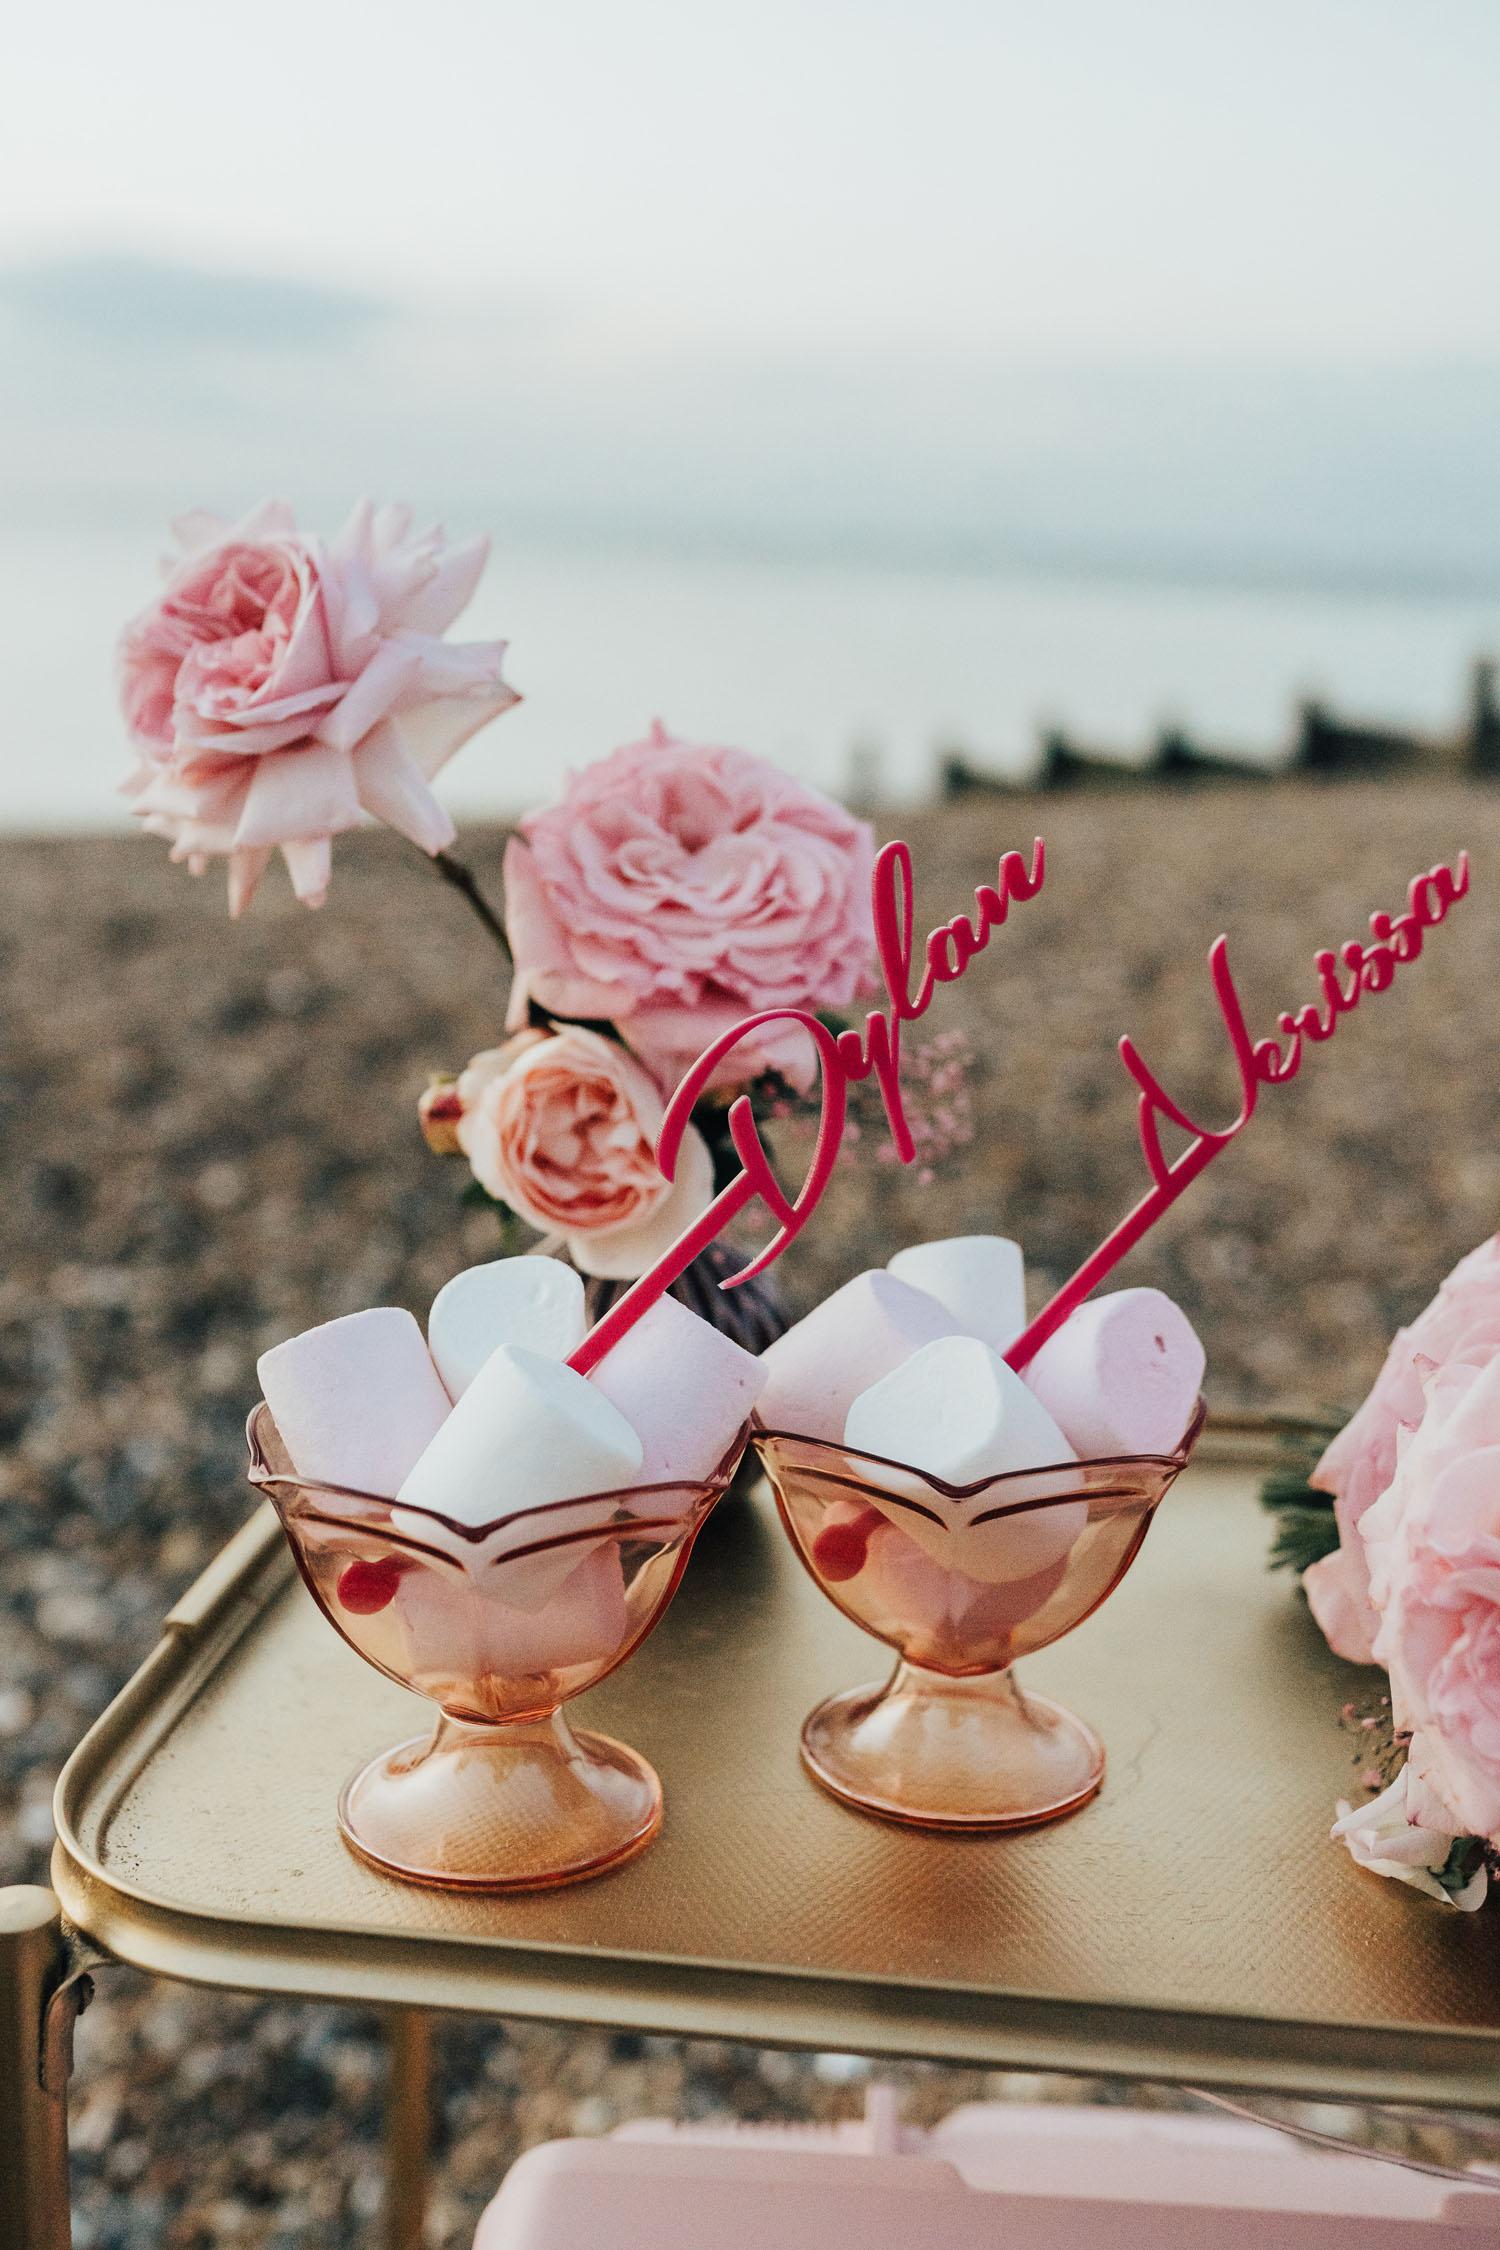 Inspiration de fugue rose au bord de la mer